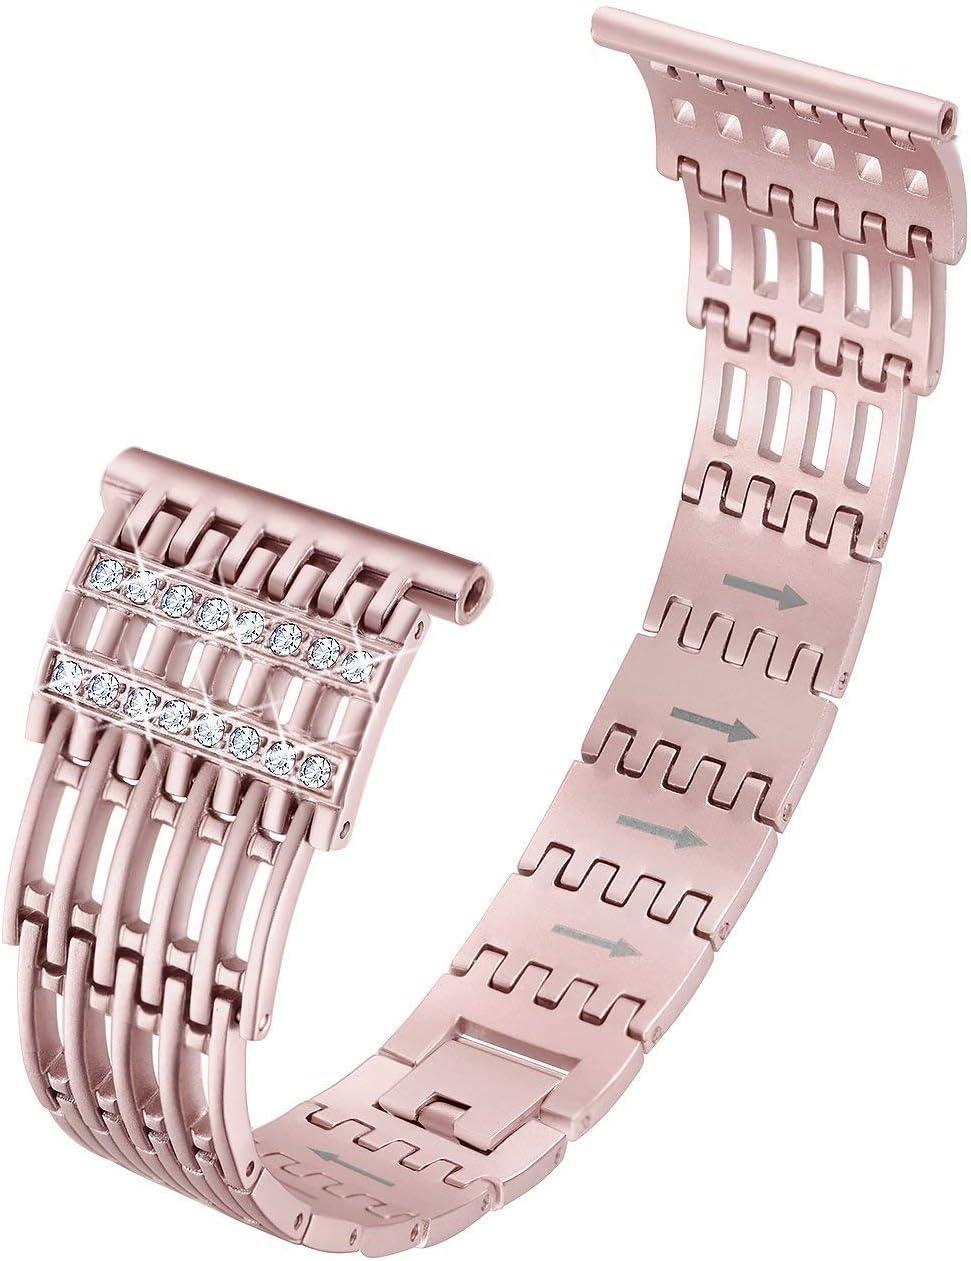 Yuehuam 腕時計バンド ステンレススチール時計バンド 交換用ストラップ ステンレススチール製中空カーブ腕時計バンド リストストラップブレスレット